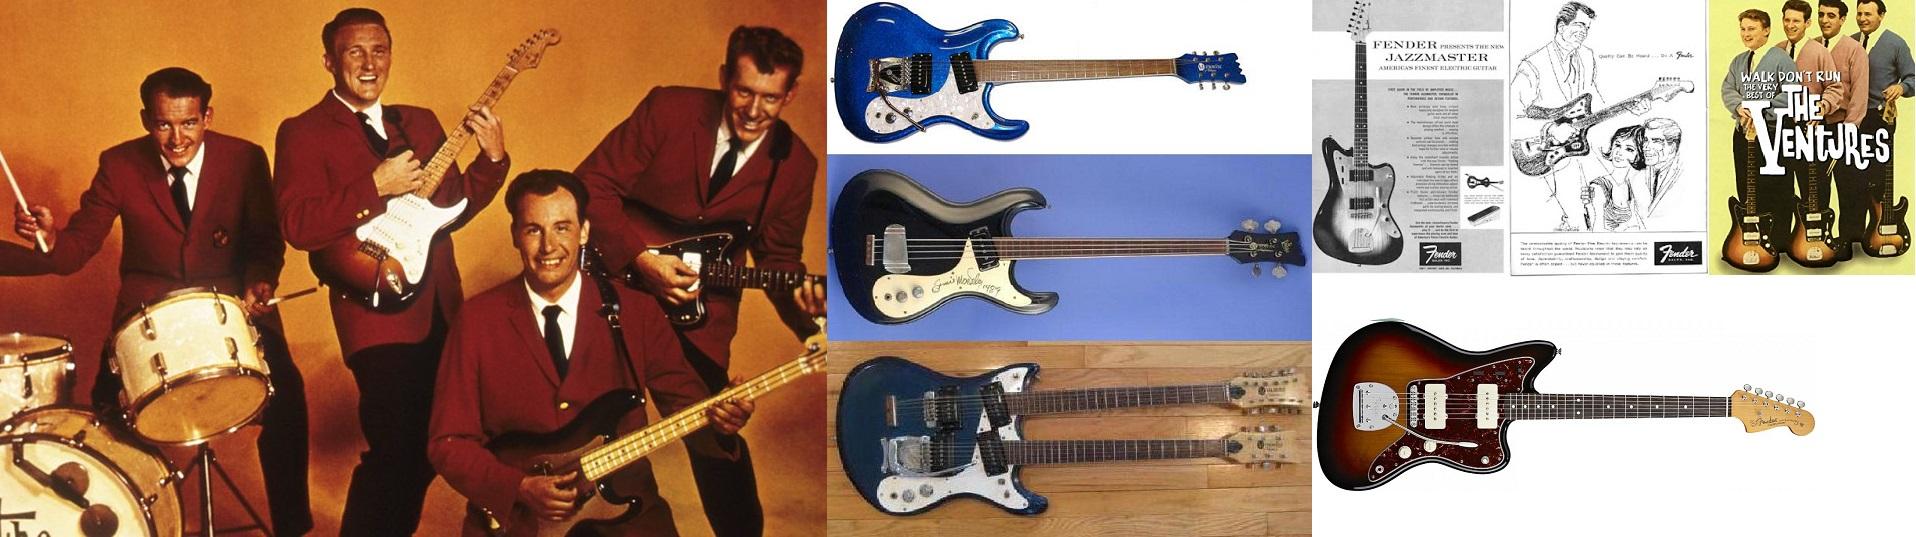 The Ventures e la Fender Jazzmaster.